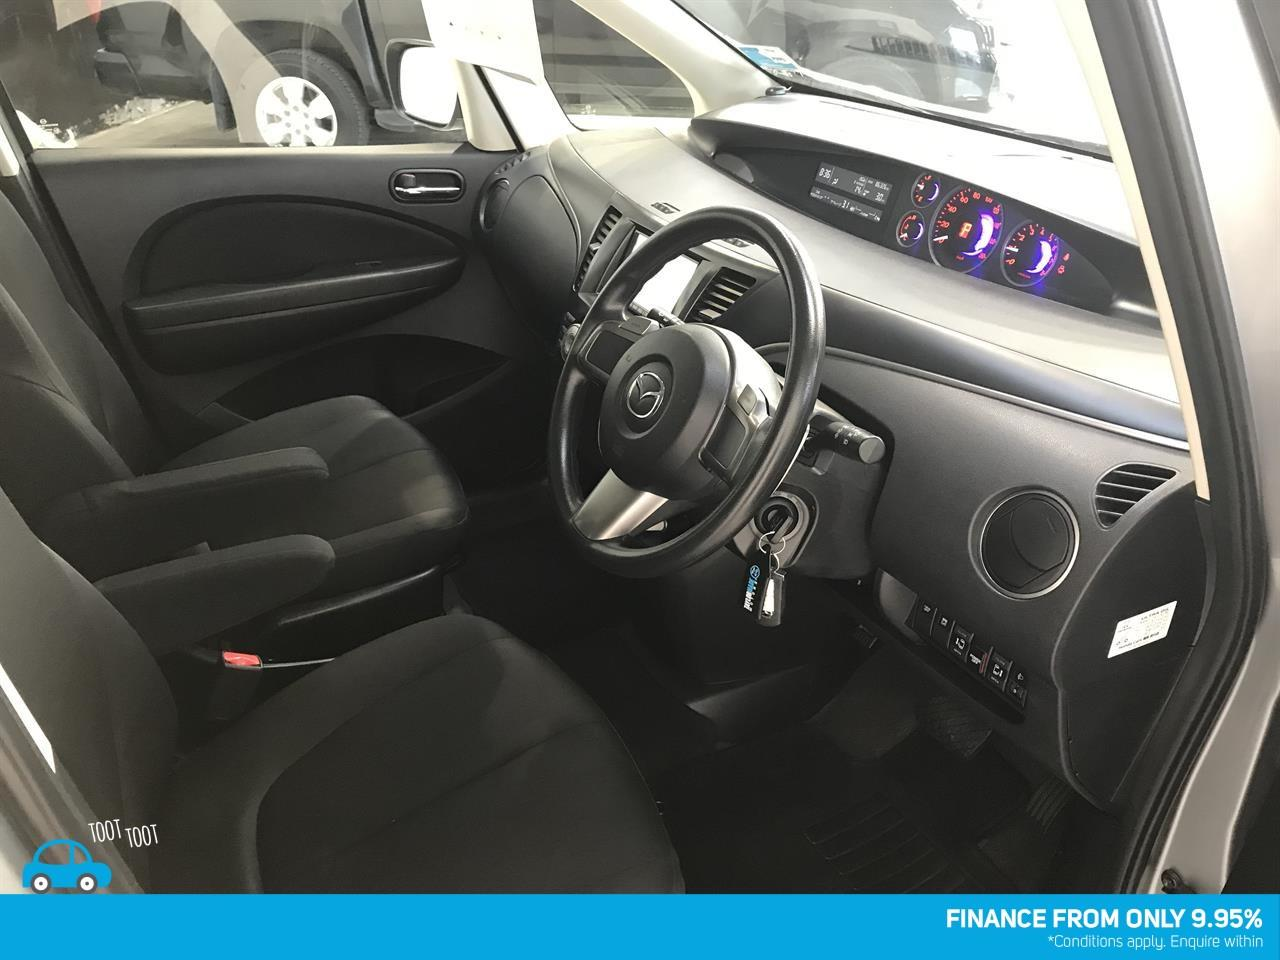 image-3, 2016 Mazda BIANTE Skyactive, 8 Seater at Dunedin